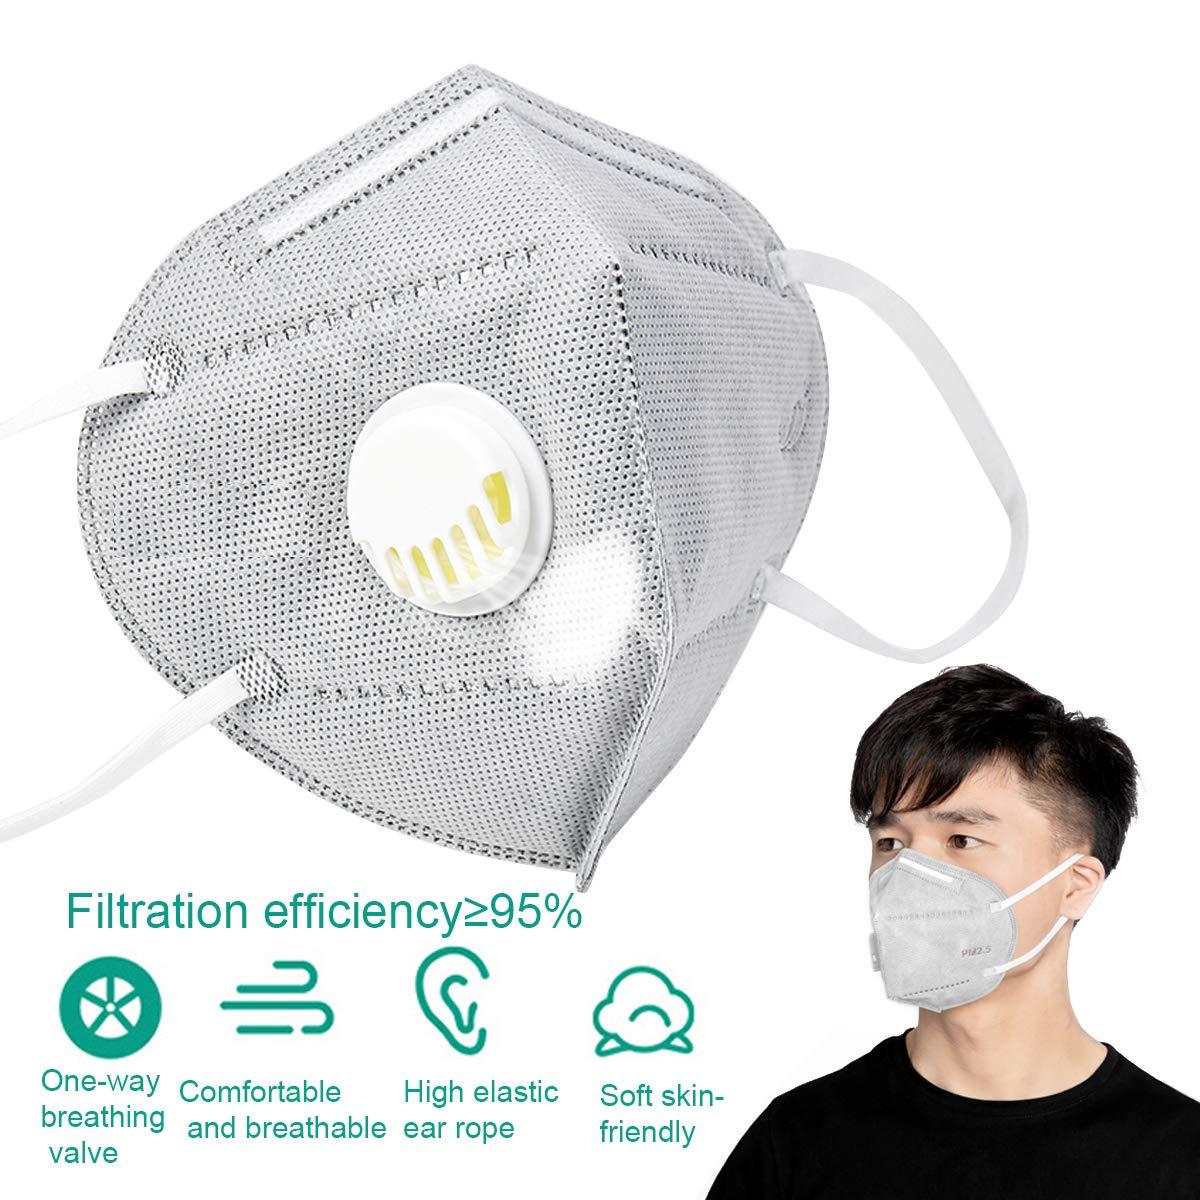 Top 5 premium international standard face masks n95 respirator face mask 3